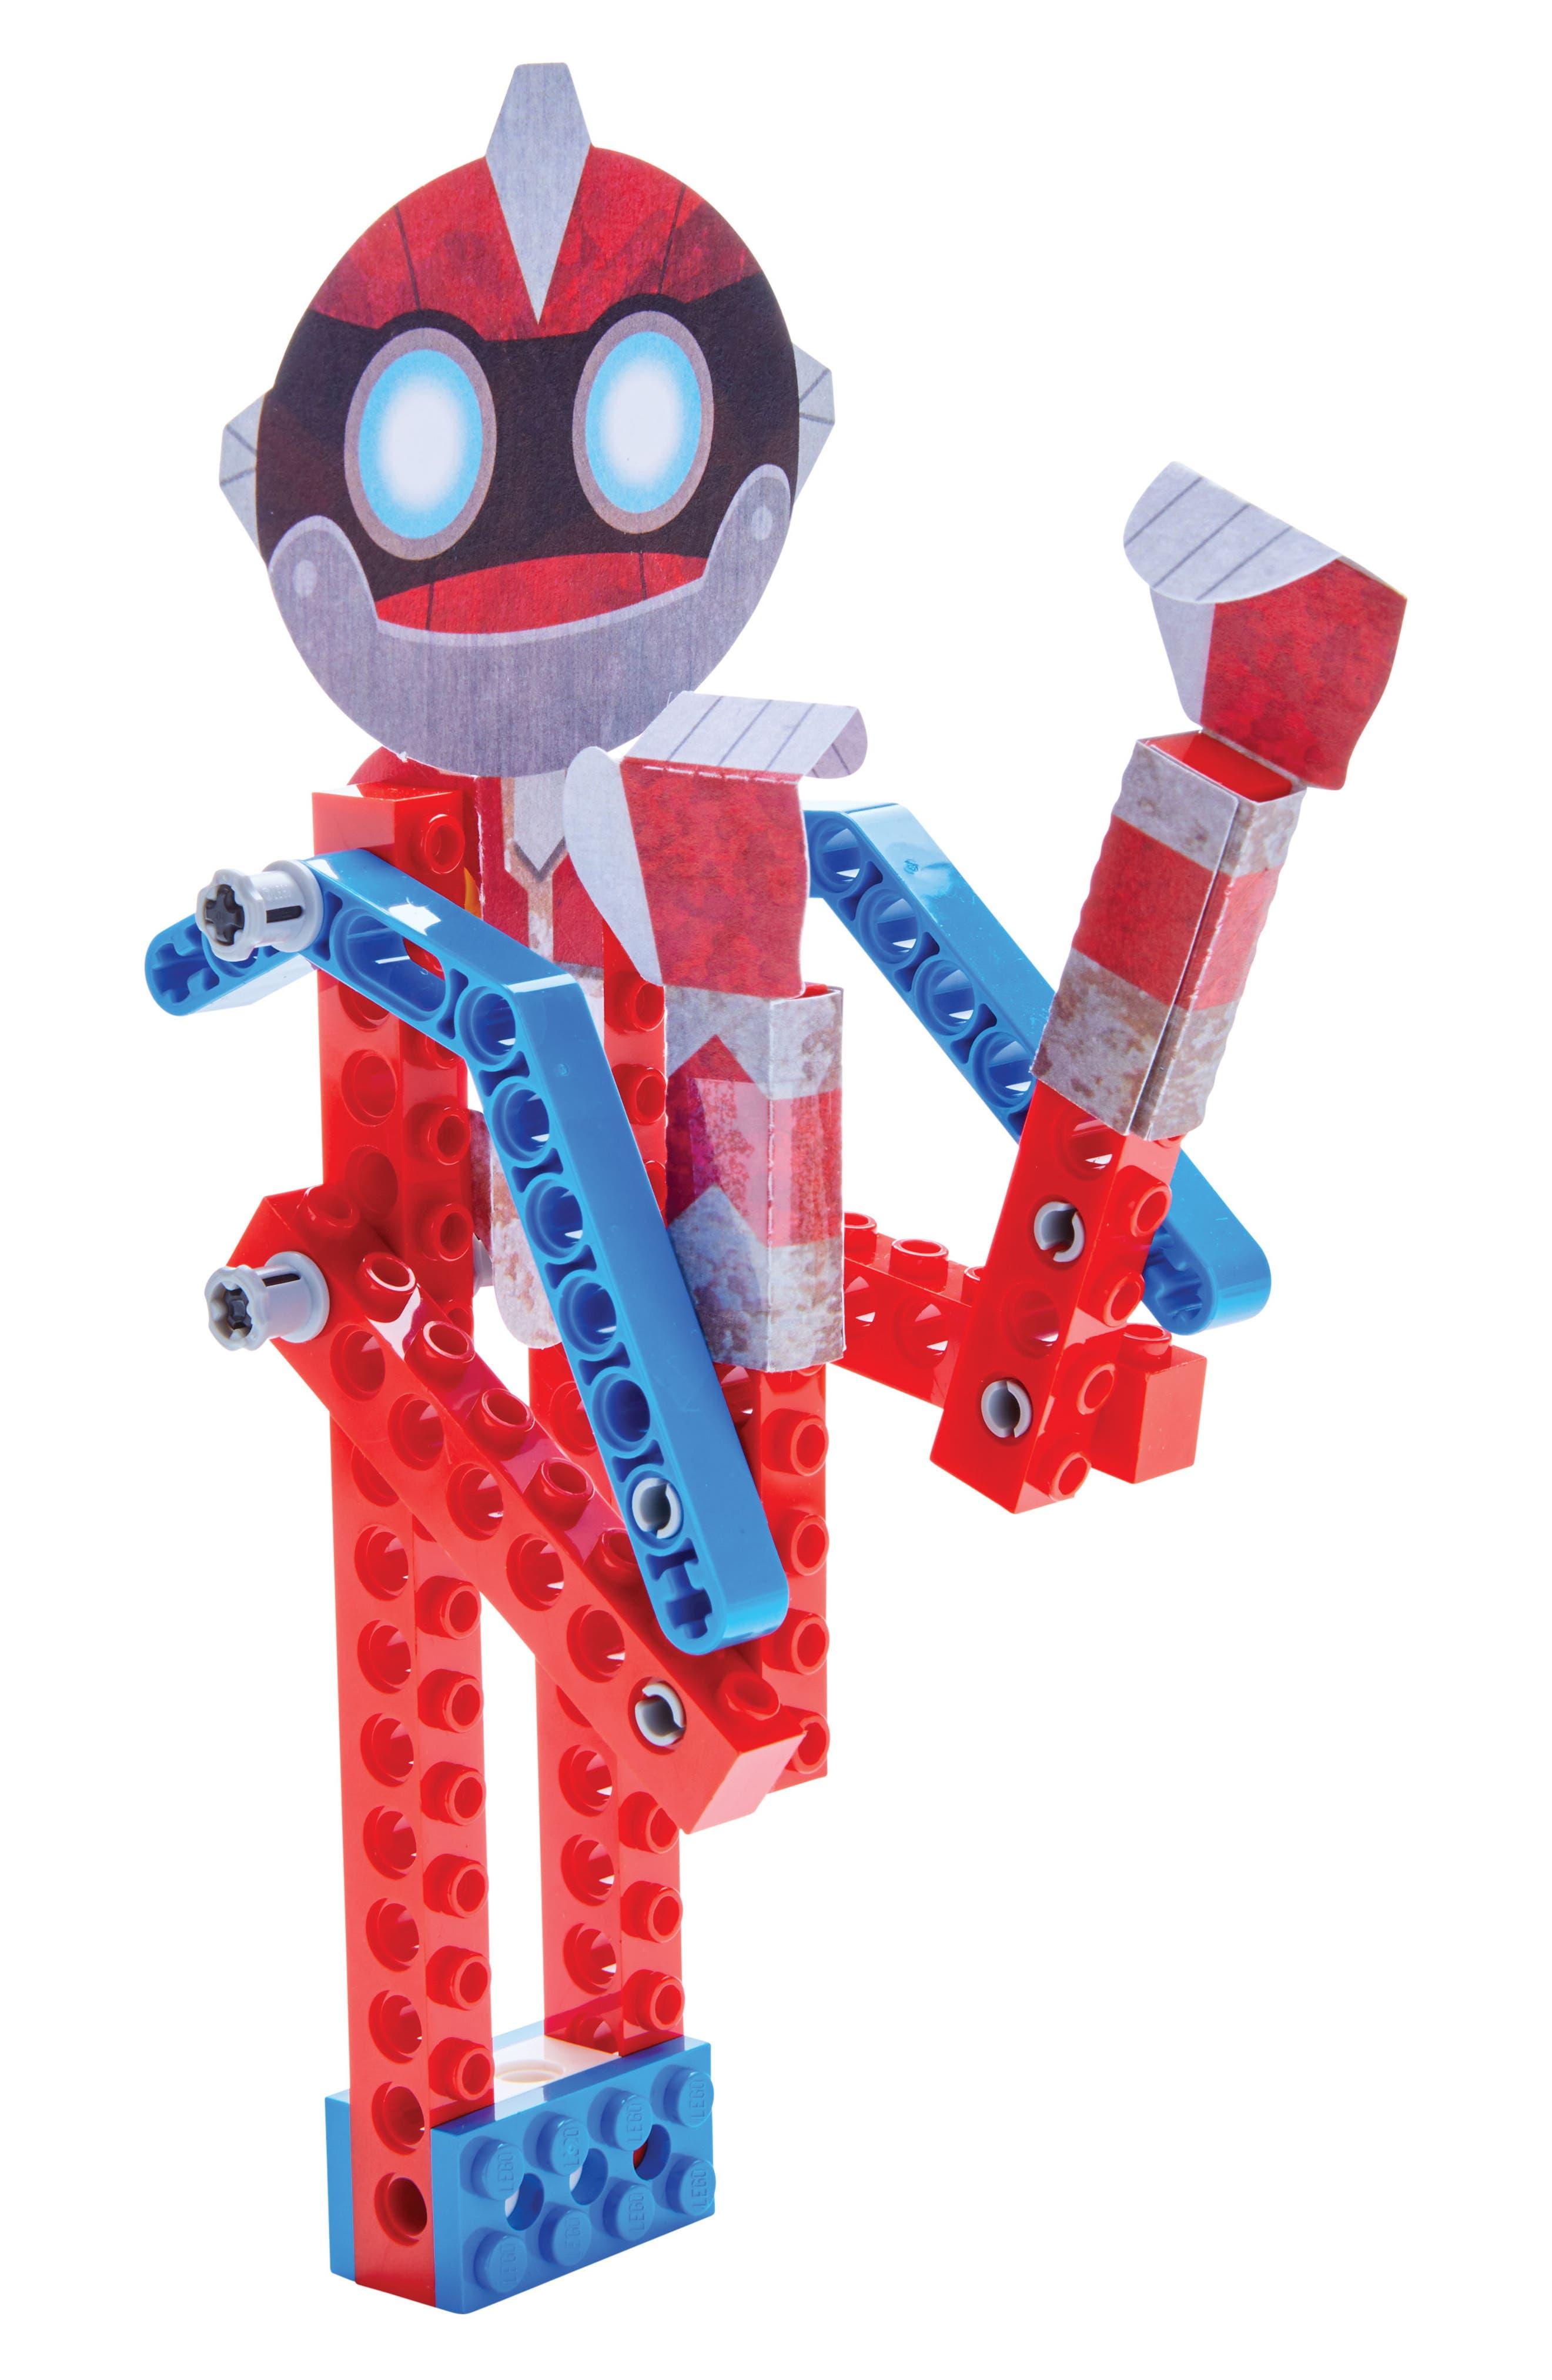 LEGO<sup>®</sup> Gadgets Activity Set,                             Alternate thumbnail 7, color,                             NONE